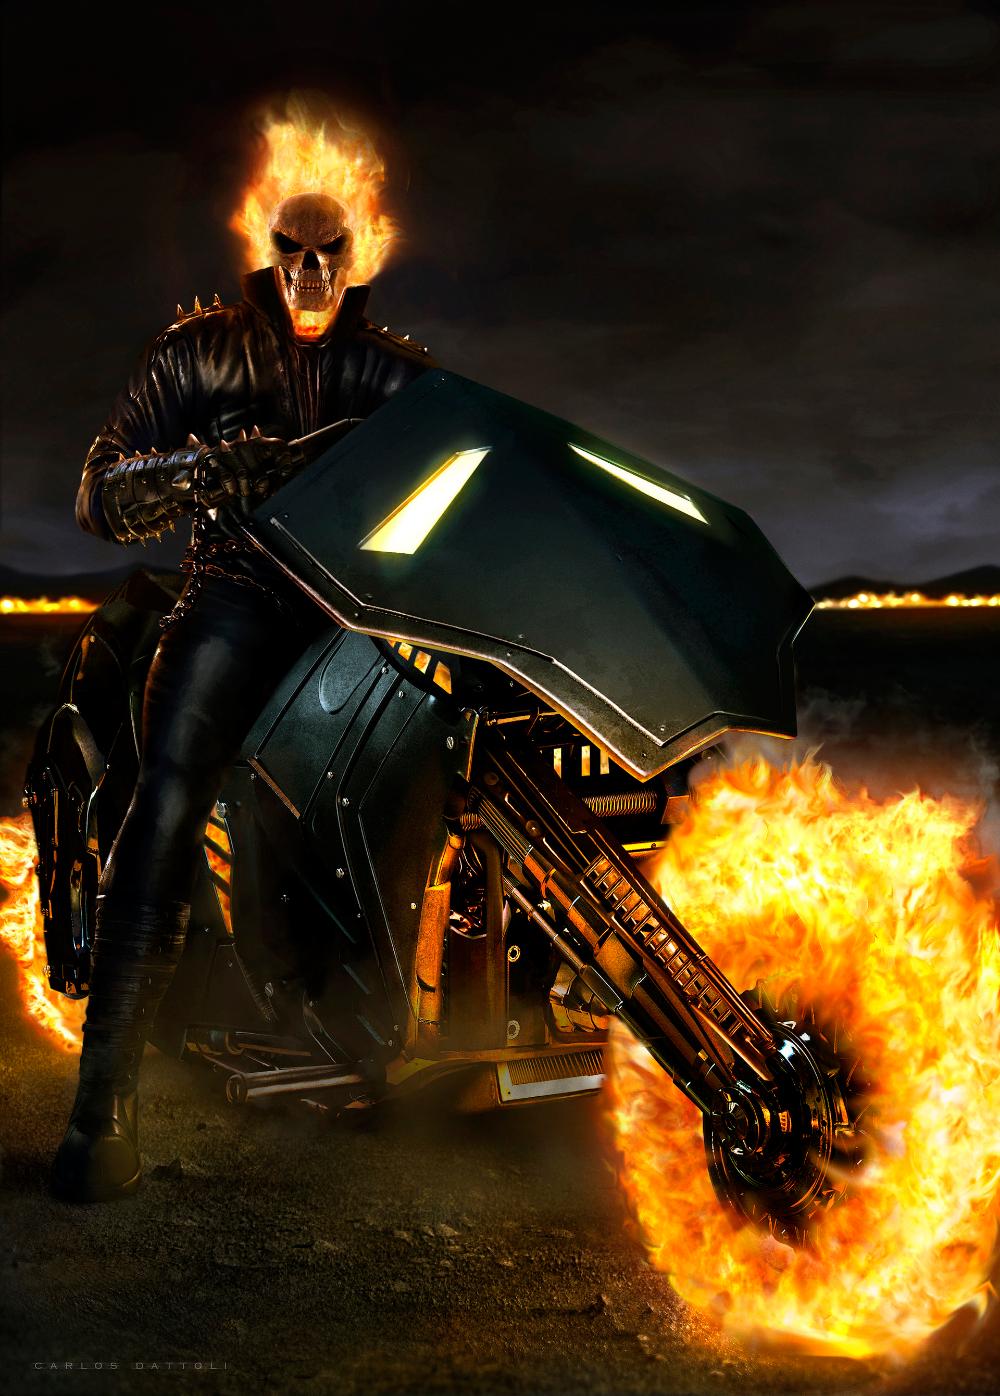 Artstation Ghost Rider 90 S Pepsicard Redesign Carlos Dattoli Ghost Rider Marvel Ghost Rider Images Ghost Rider Wallpaper